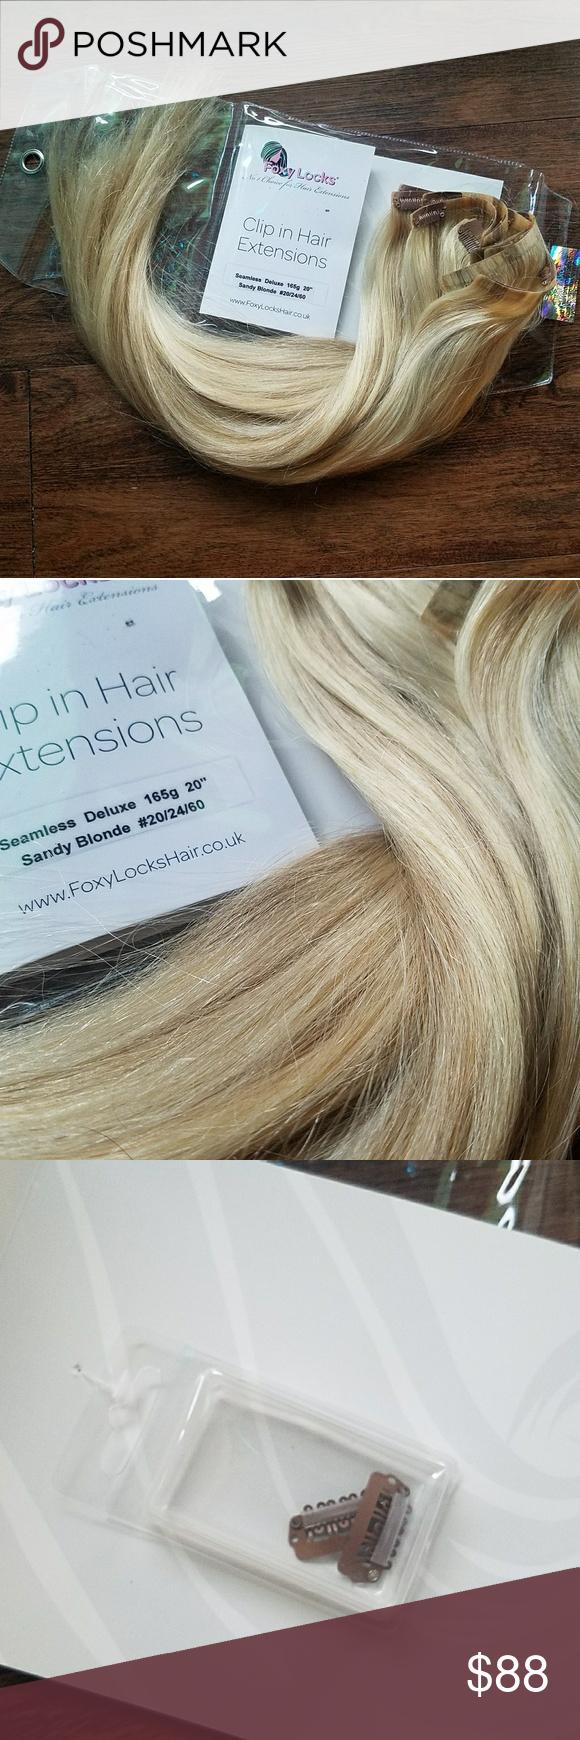 Foxy Locks Clip In Hair Extensions My Posh Closet Pinterest